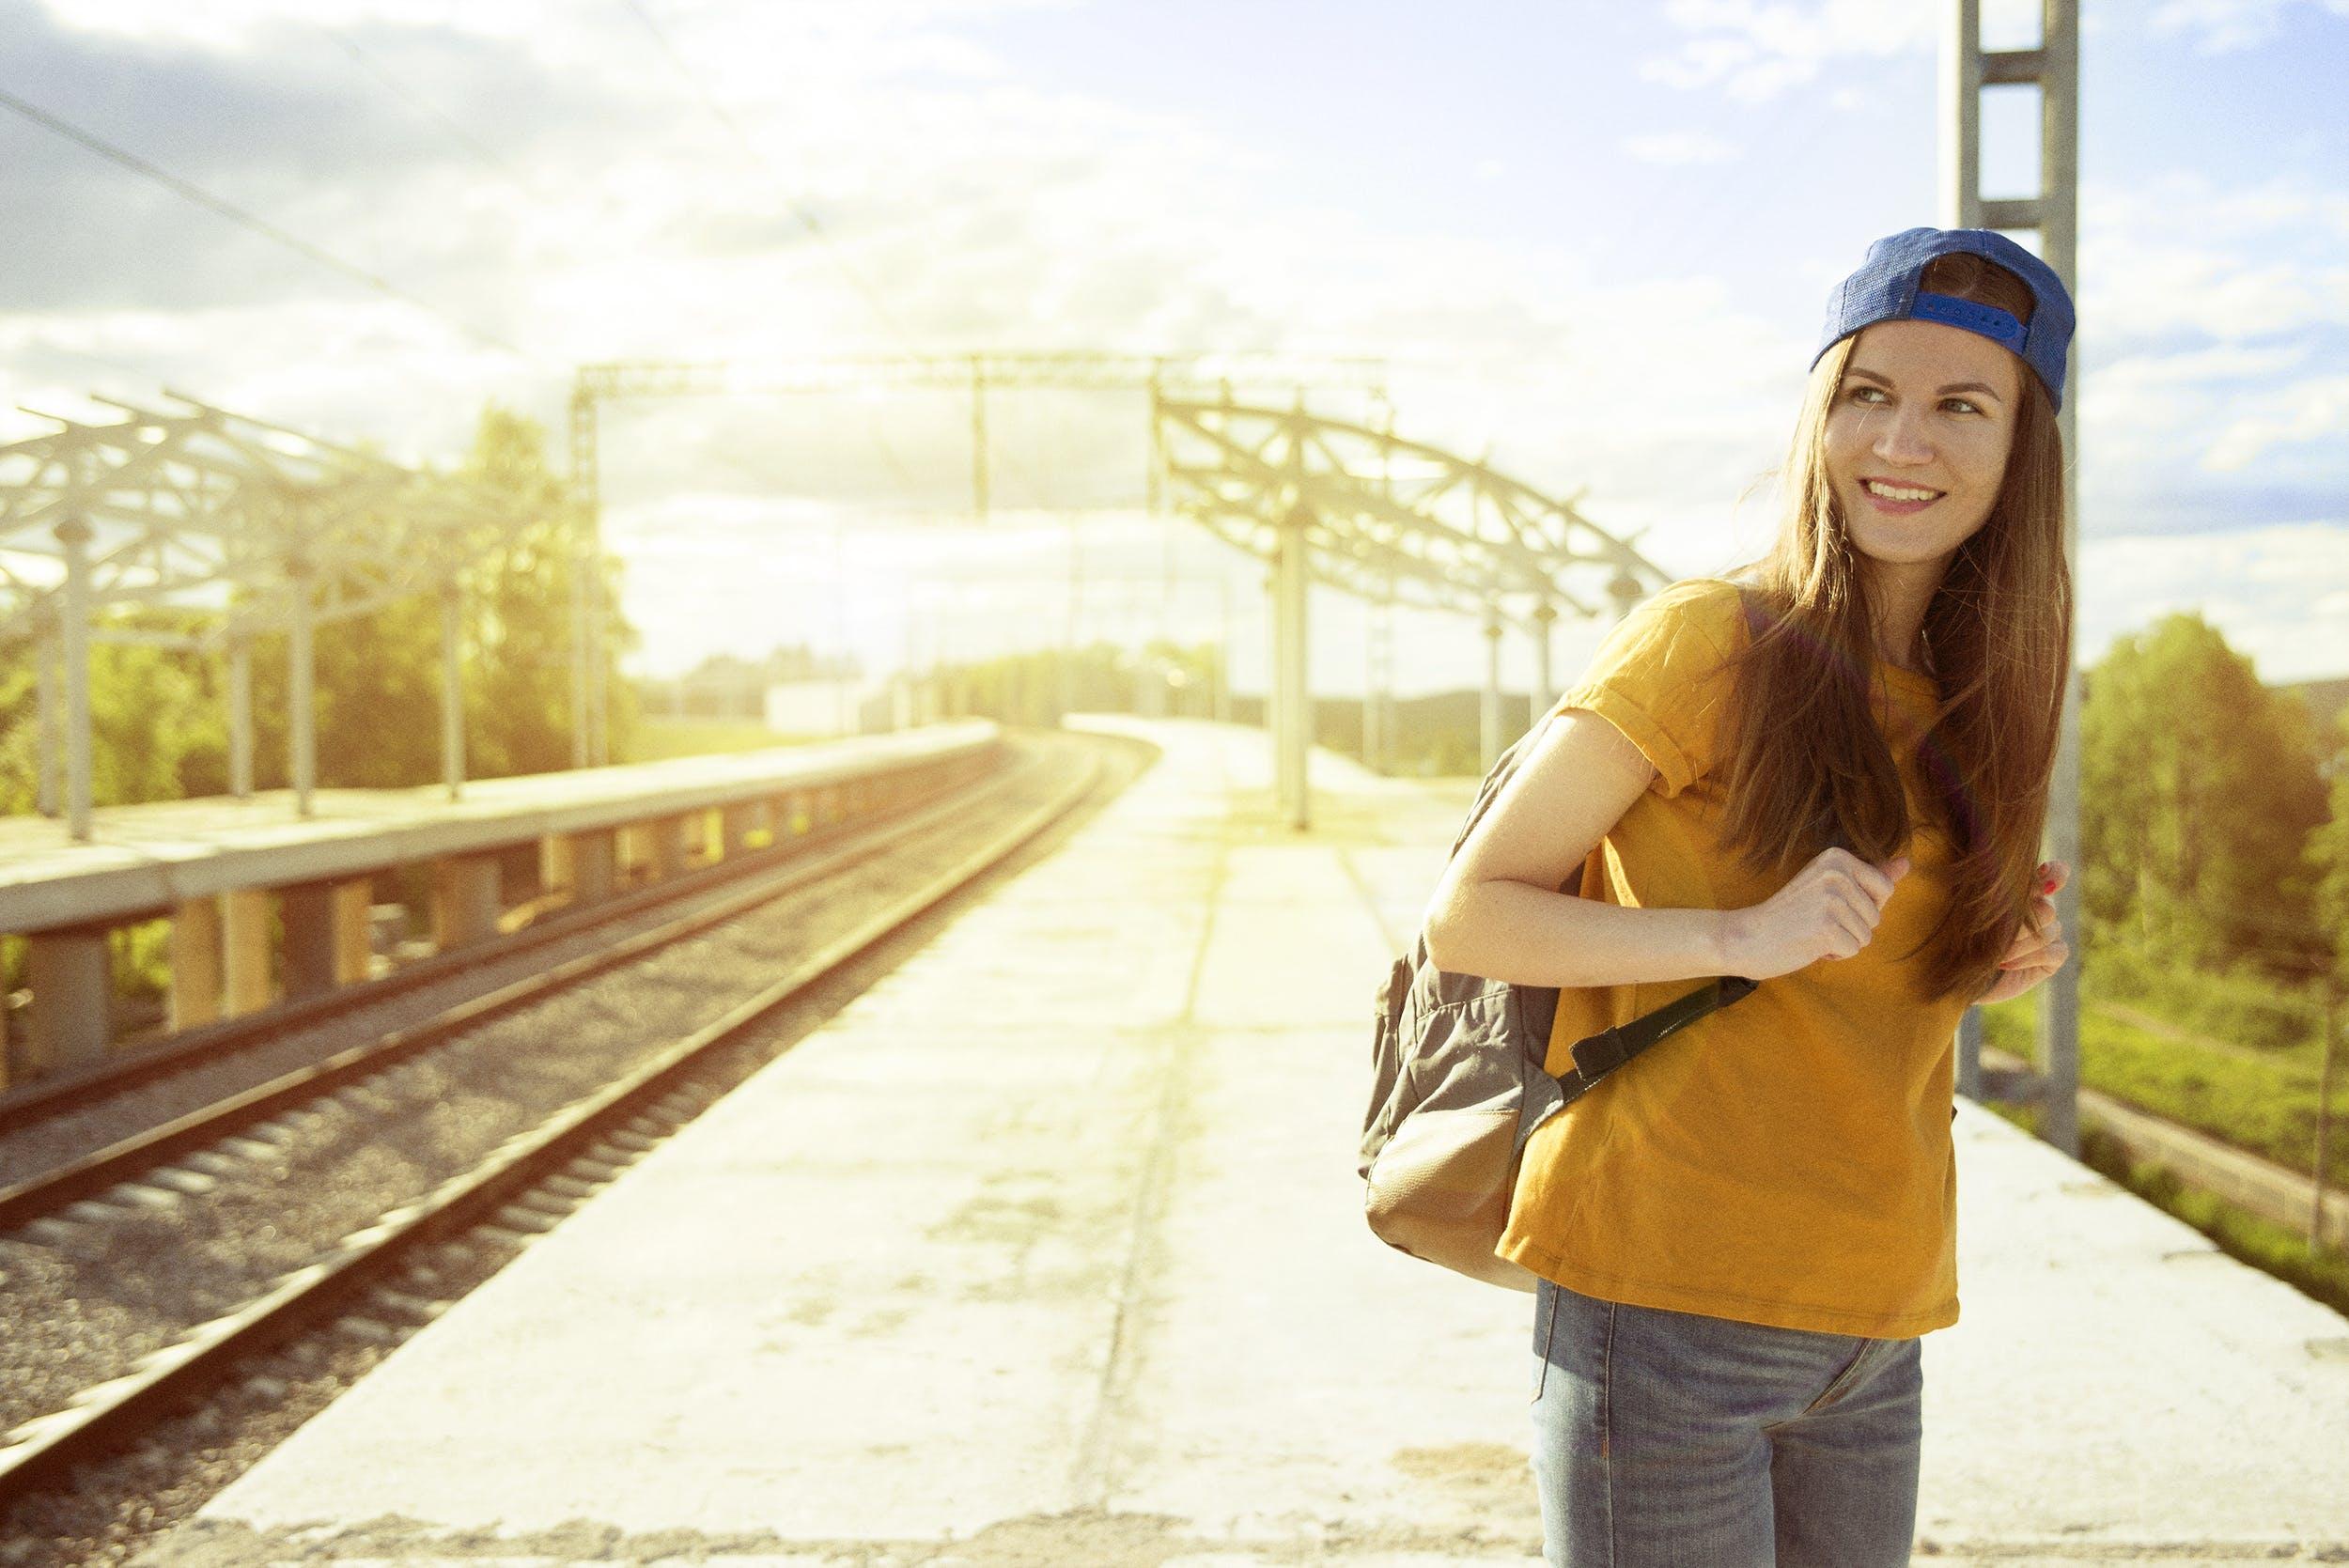 Kostenloses Stock Foto zu eisenbahn, frau, fröhlich, himmel